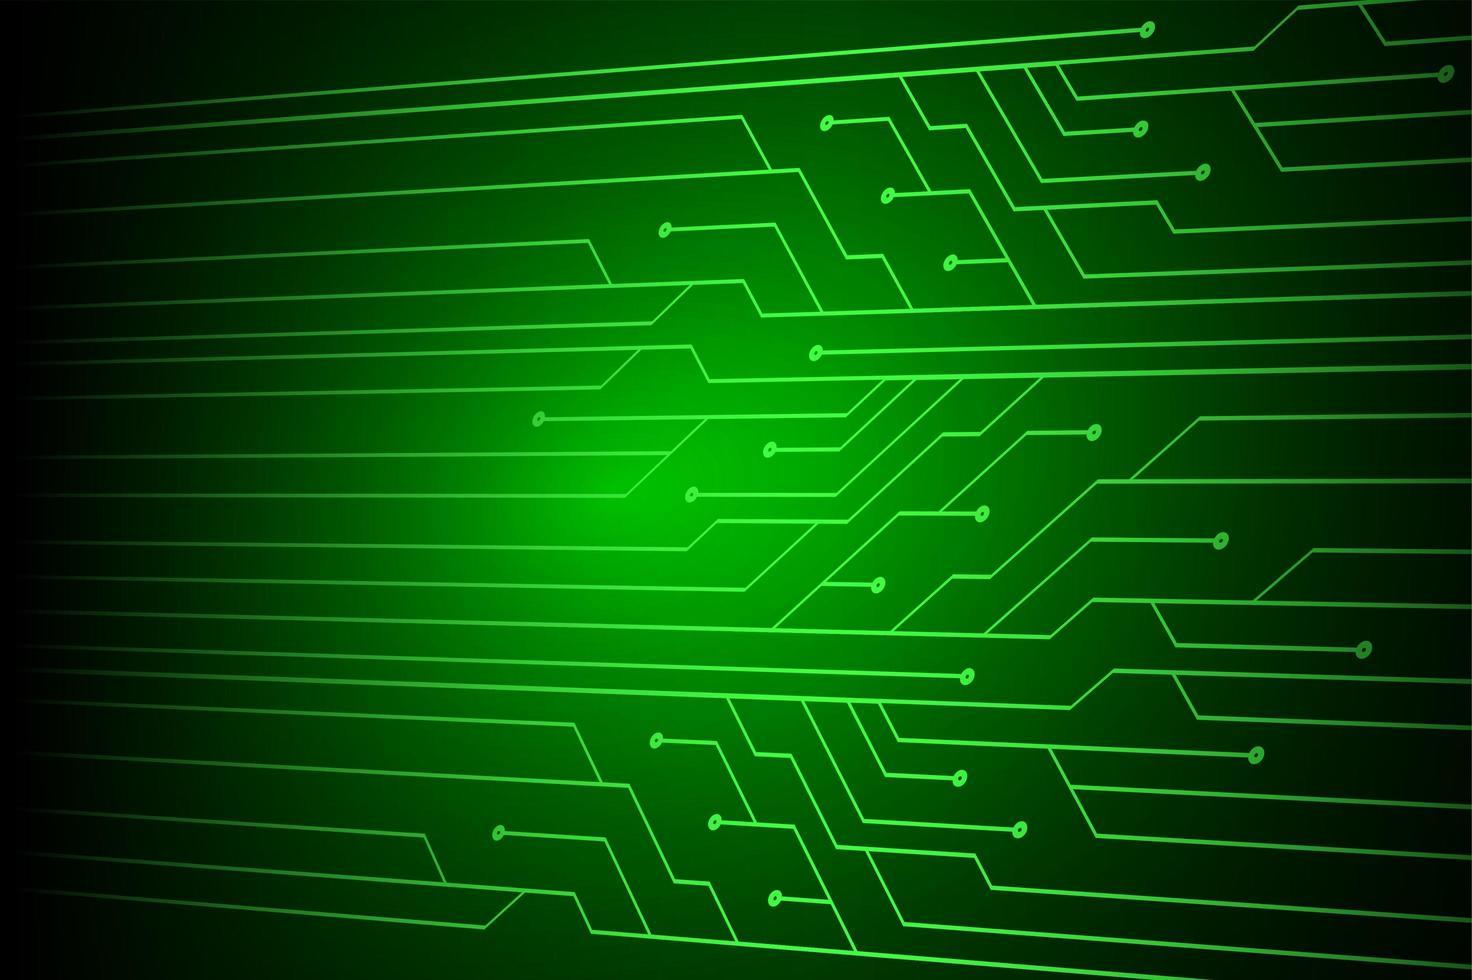 eenvoudige groene cybercircuit toekomstige technologie vector